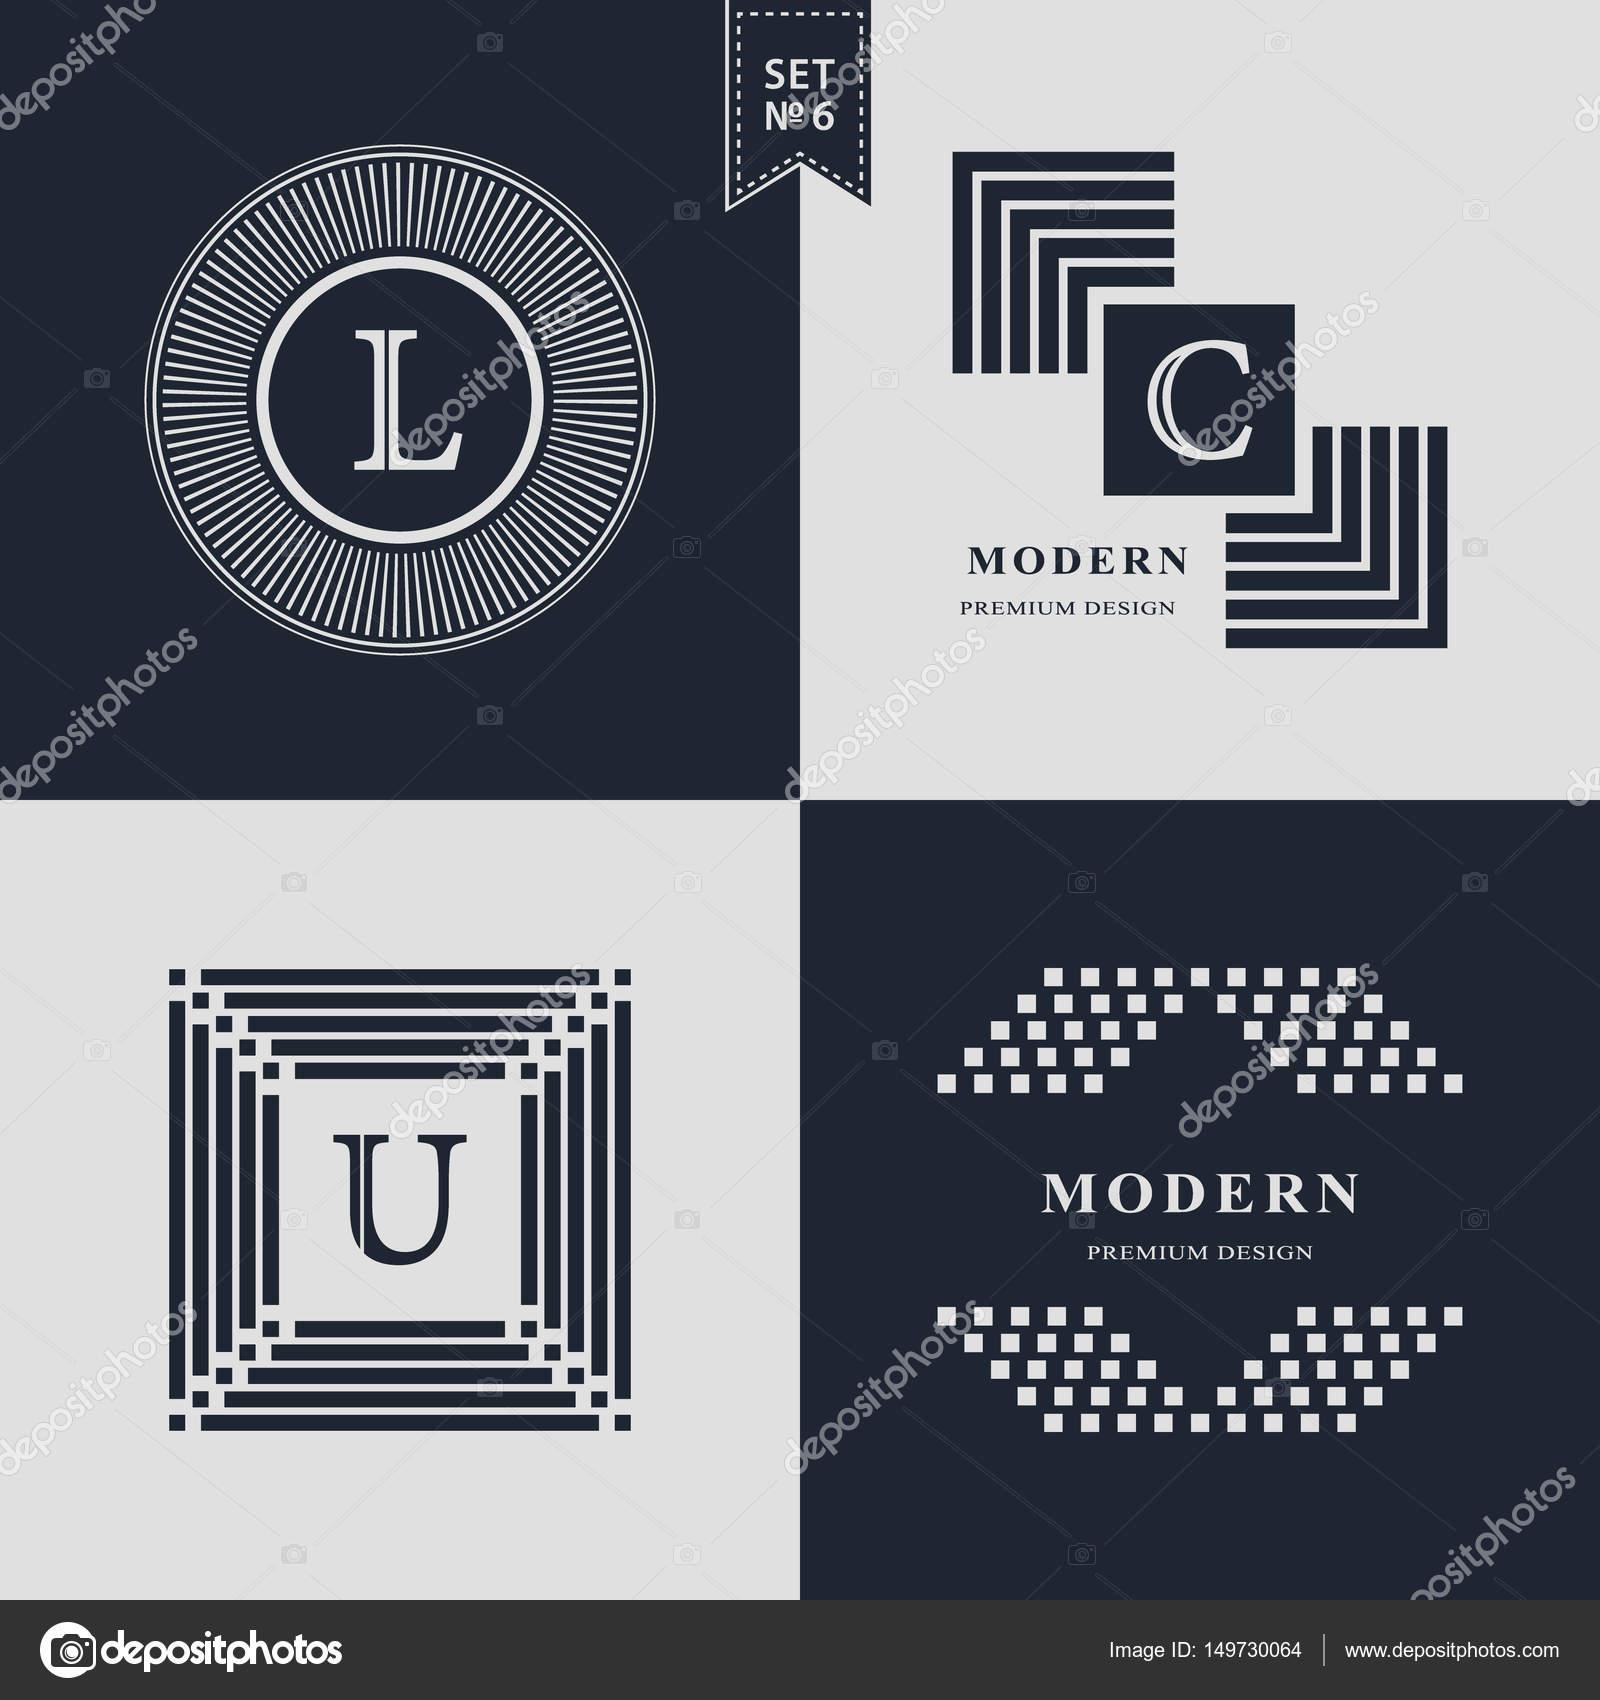 Logos Design Templates Set. Logotypes elements collection, Icons ...